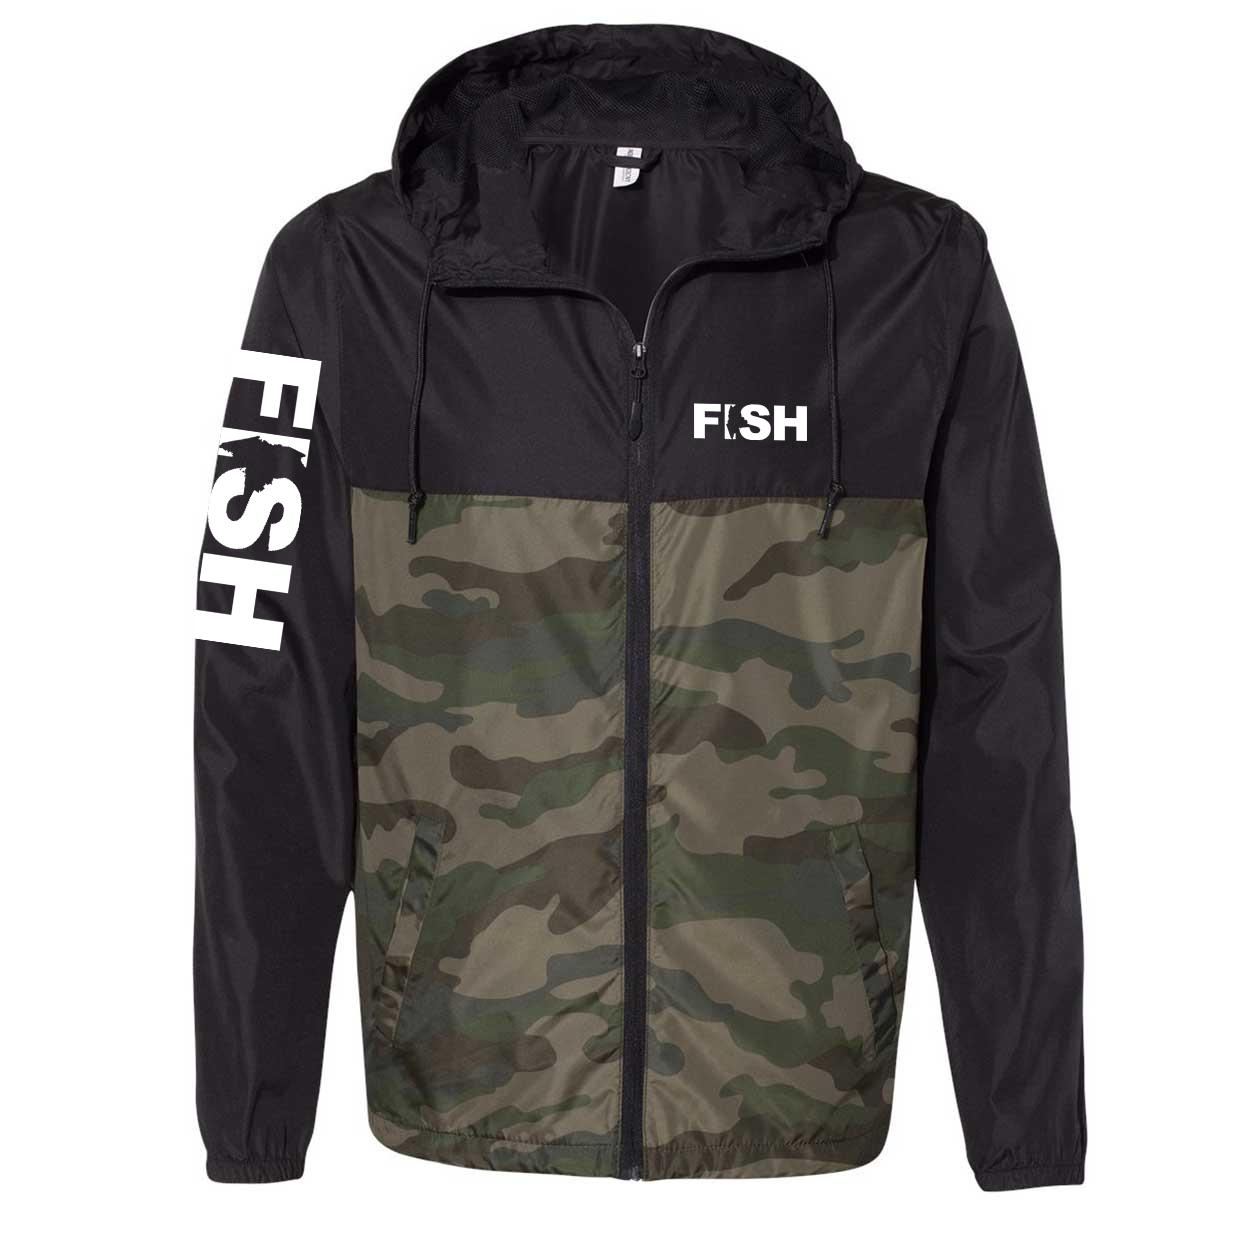 Fish Maine Classic Lightweight Windbreaker Black/Forest Camo (White Logo)